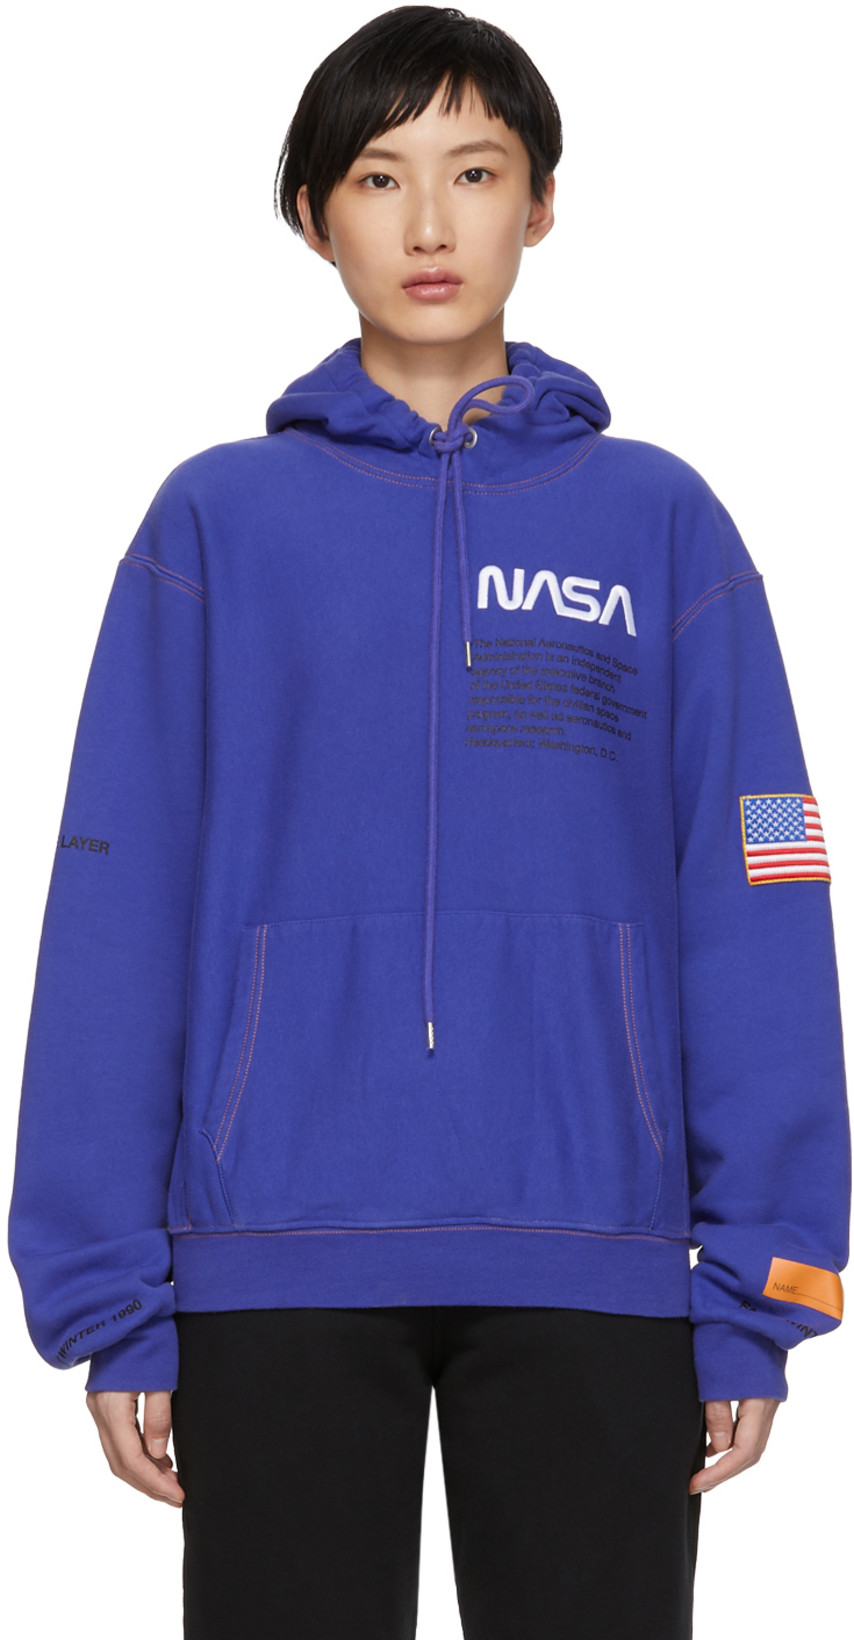 CNK-HP-NASA-3.jpg